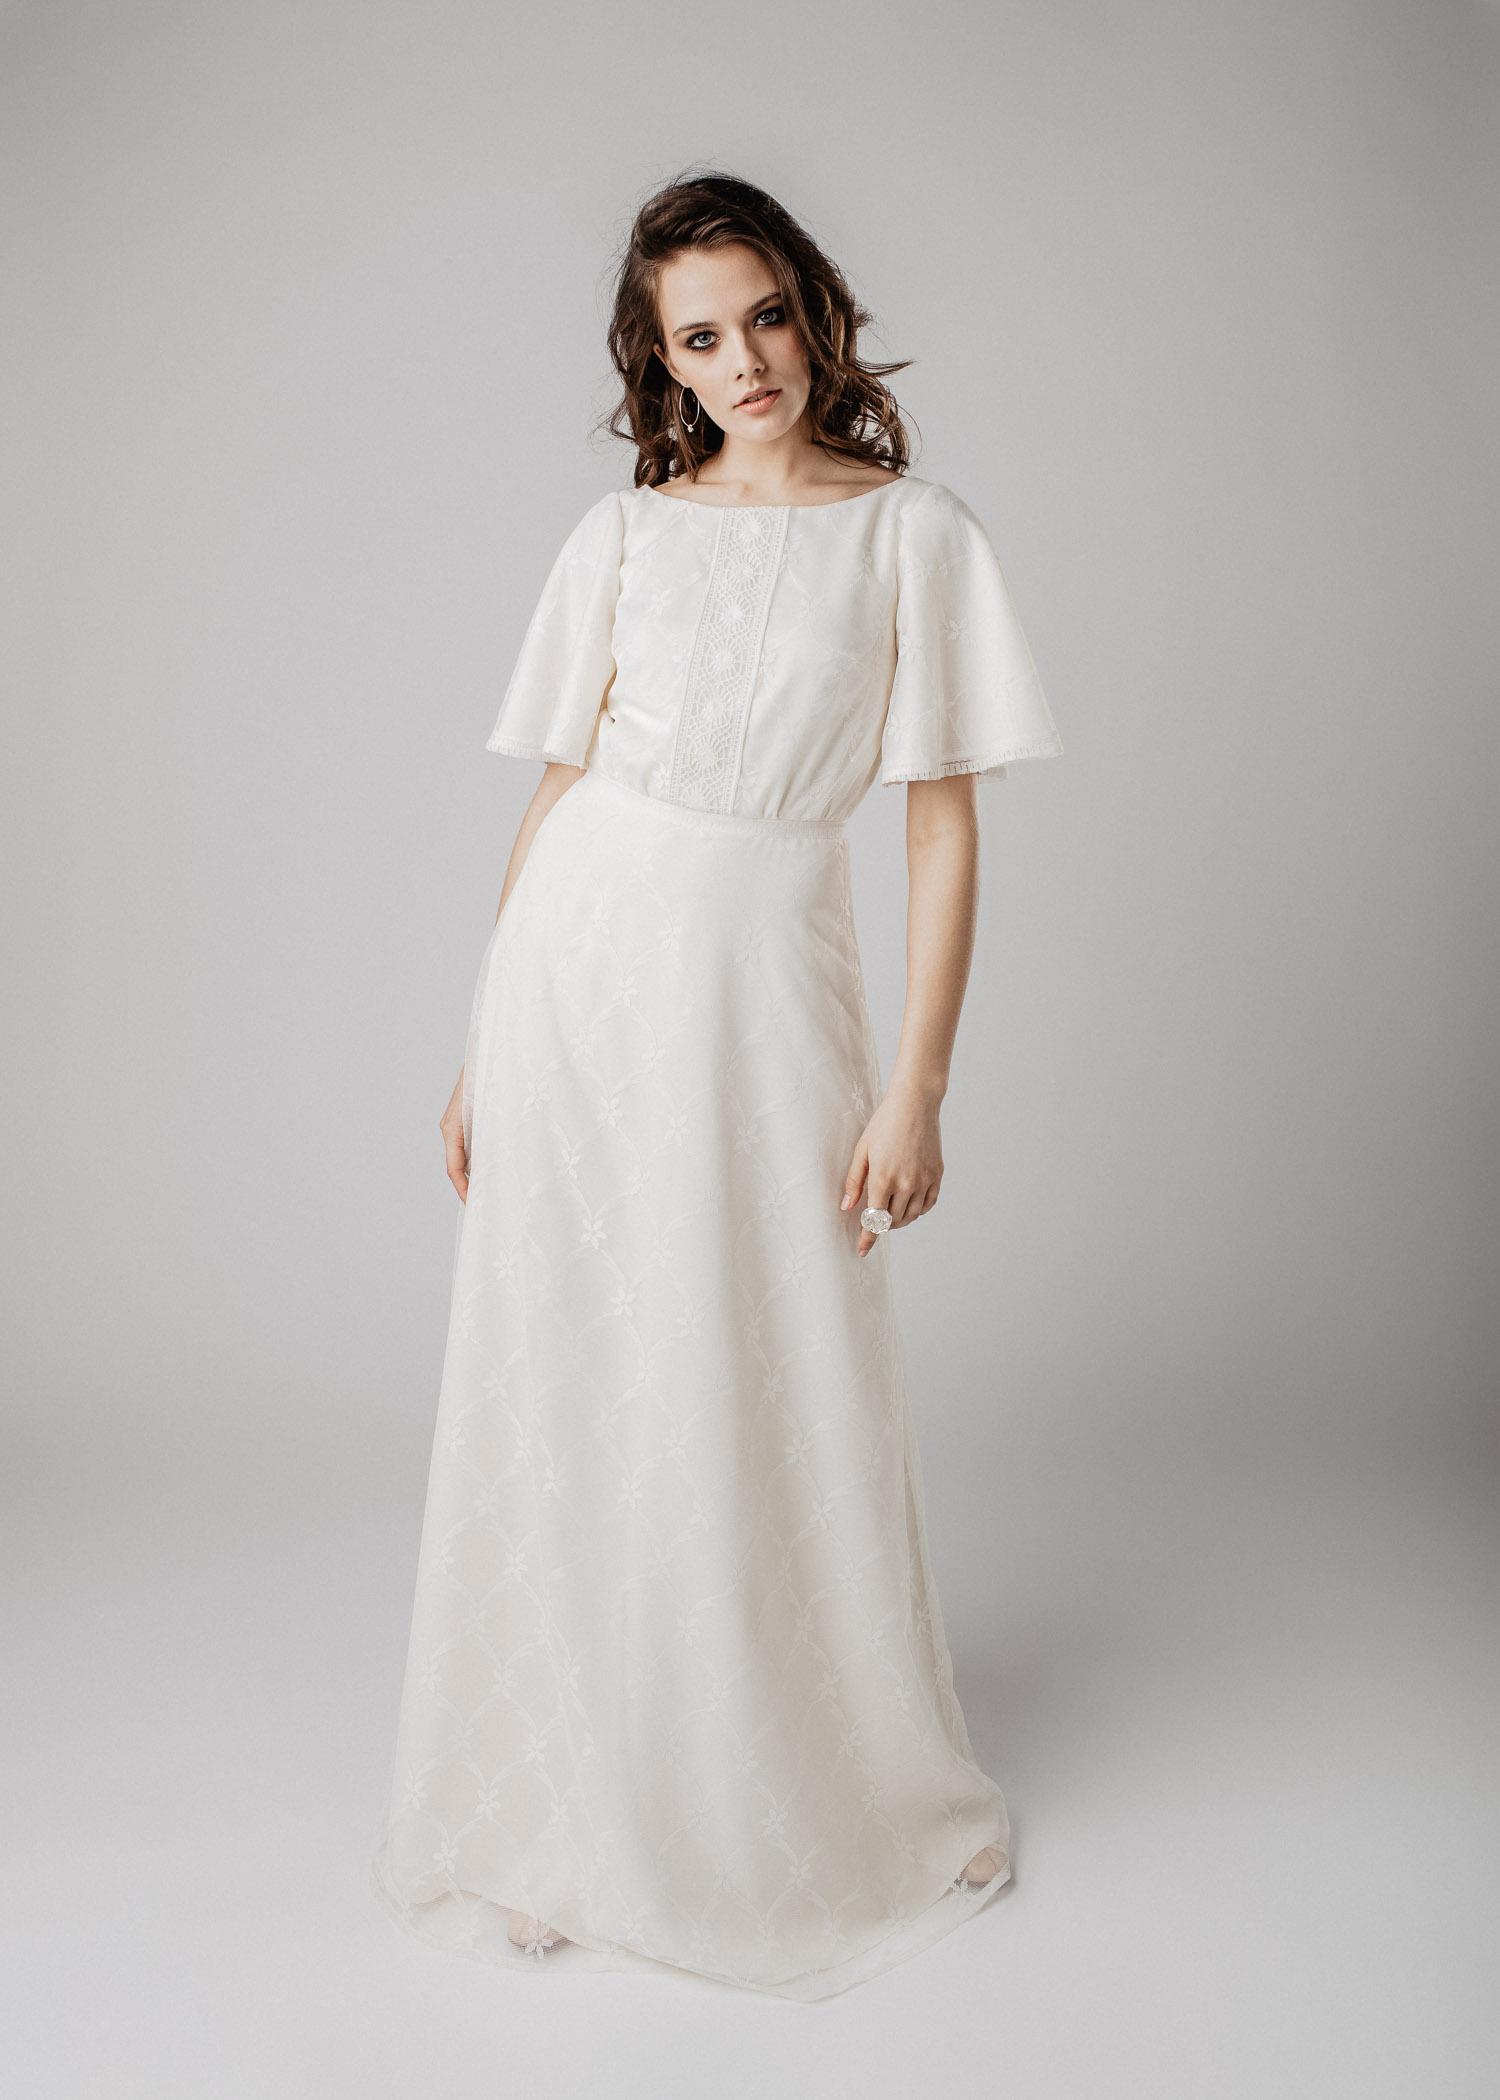 MADRID wedding gown